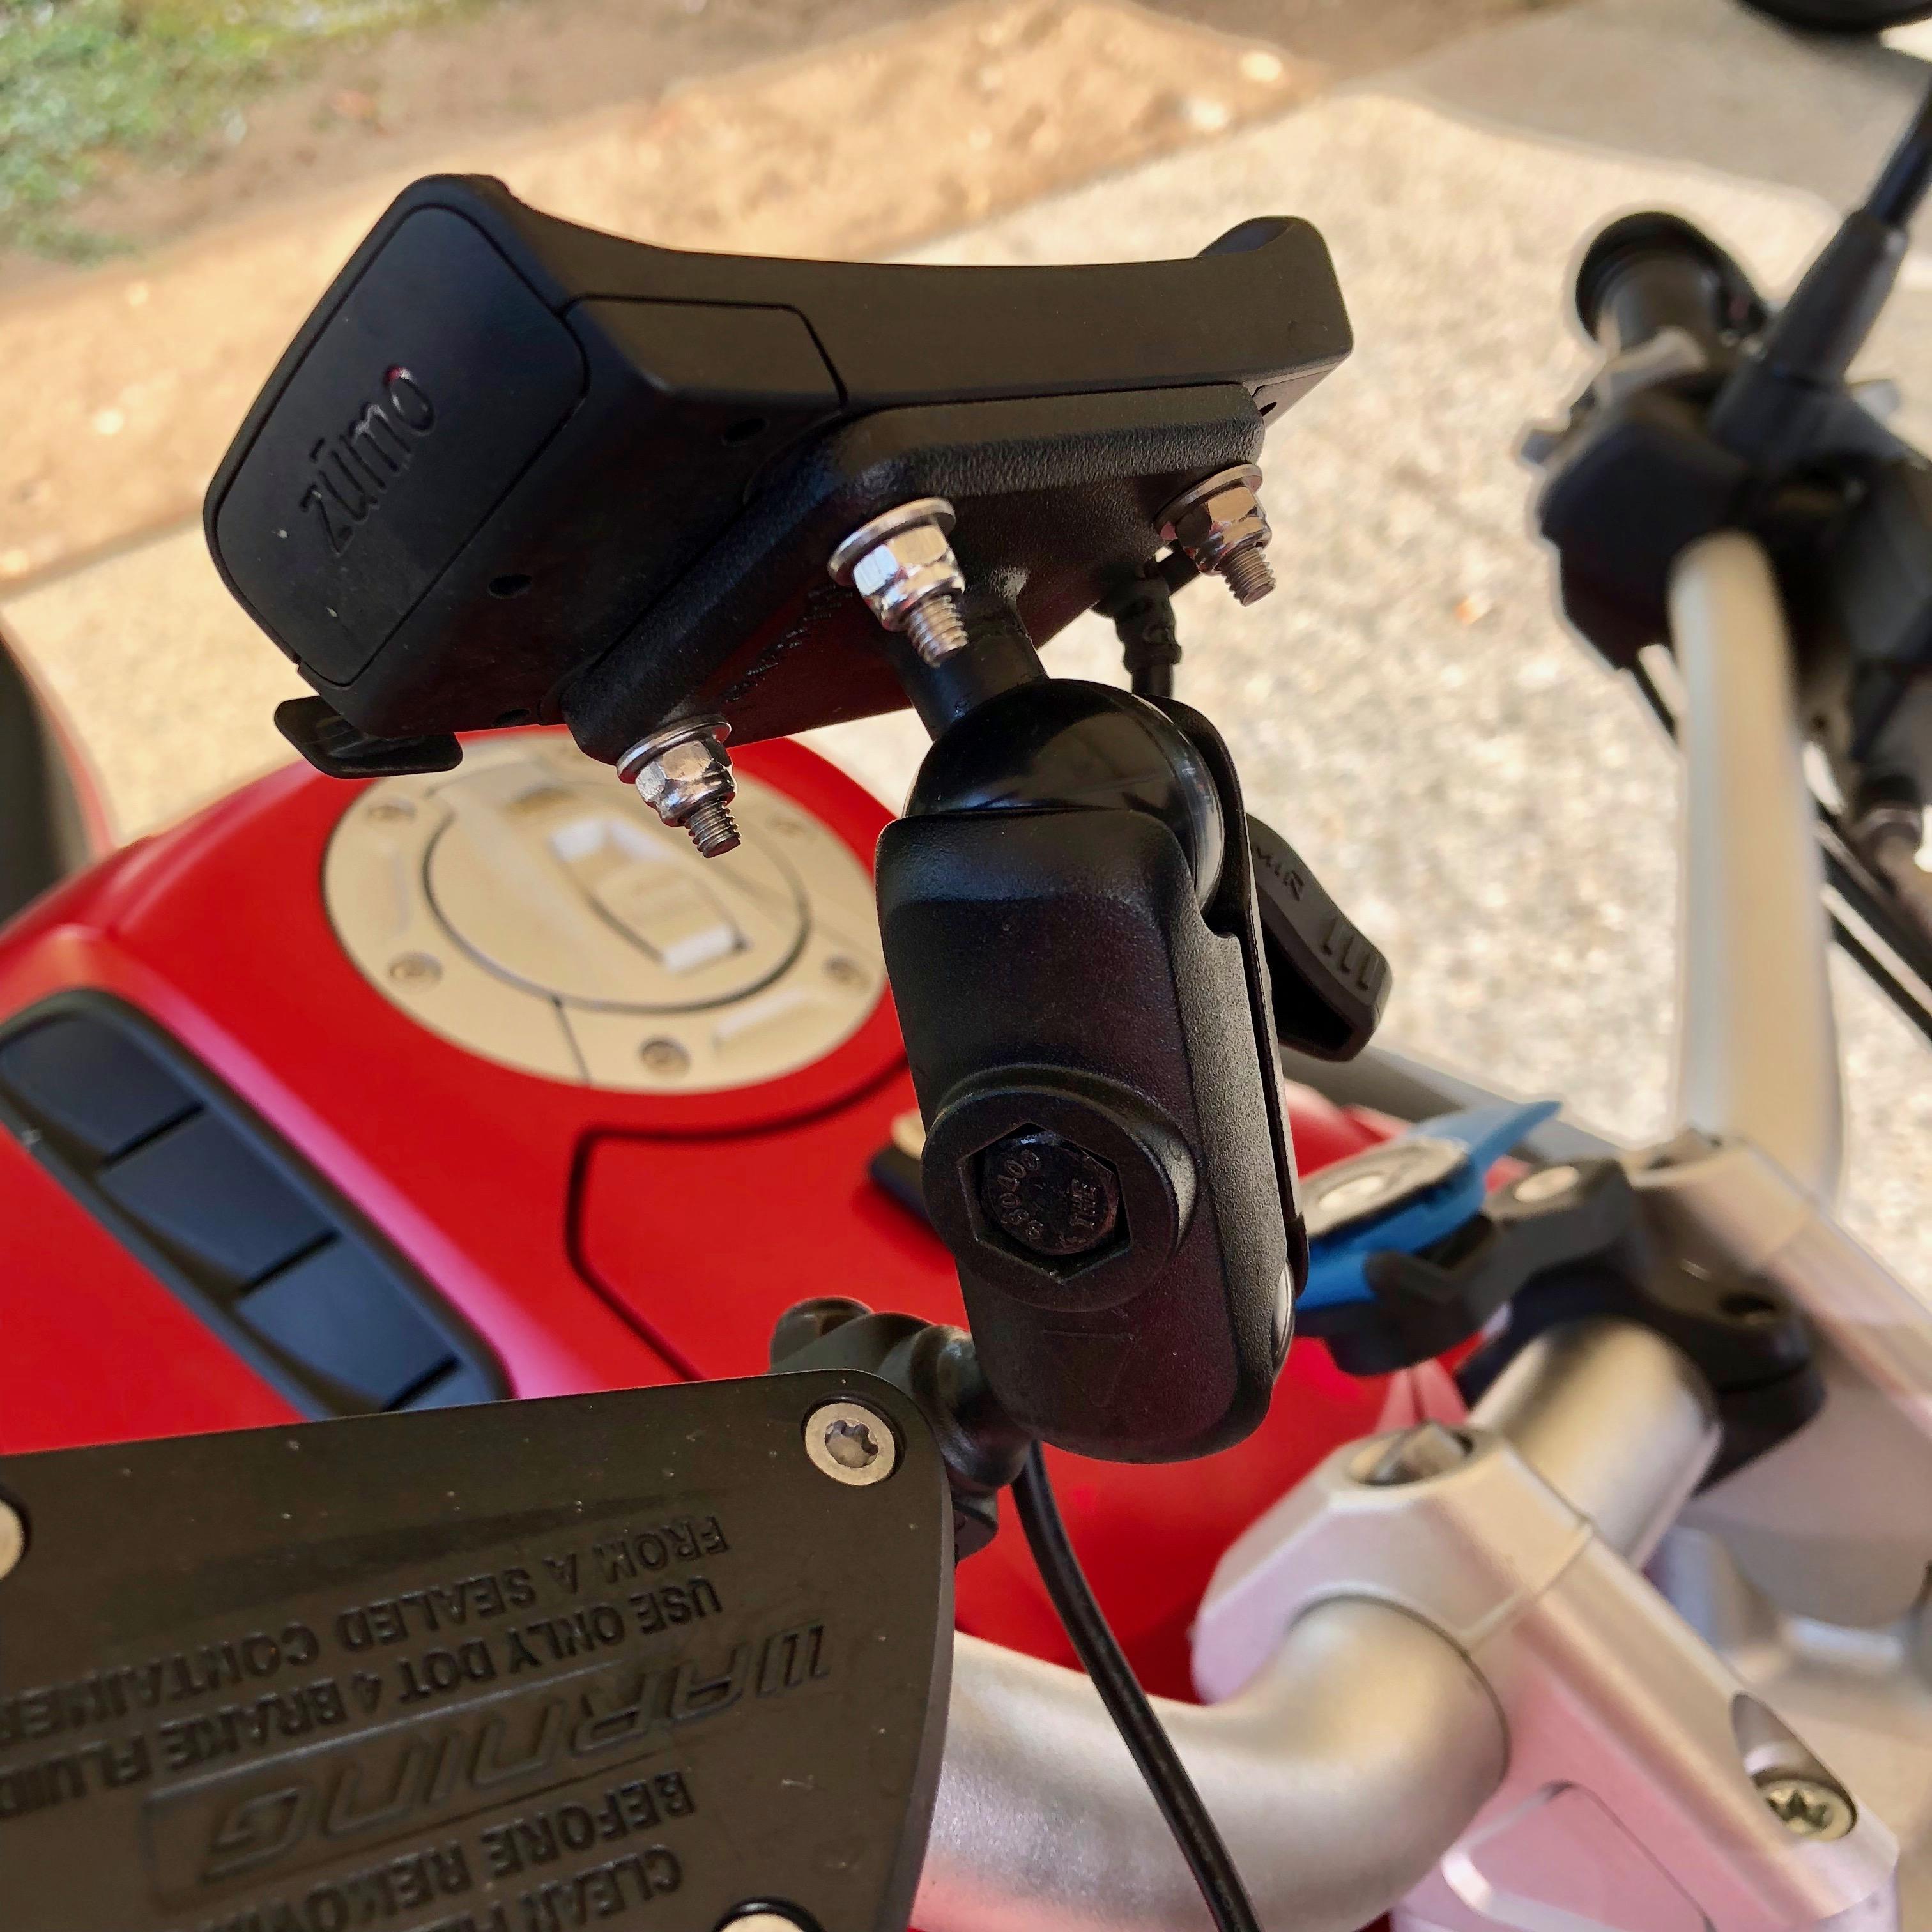 Fixation du GPS Garmin 346 LMT-S